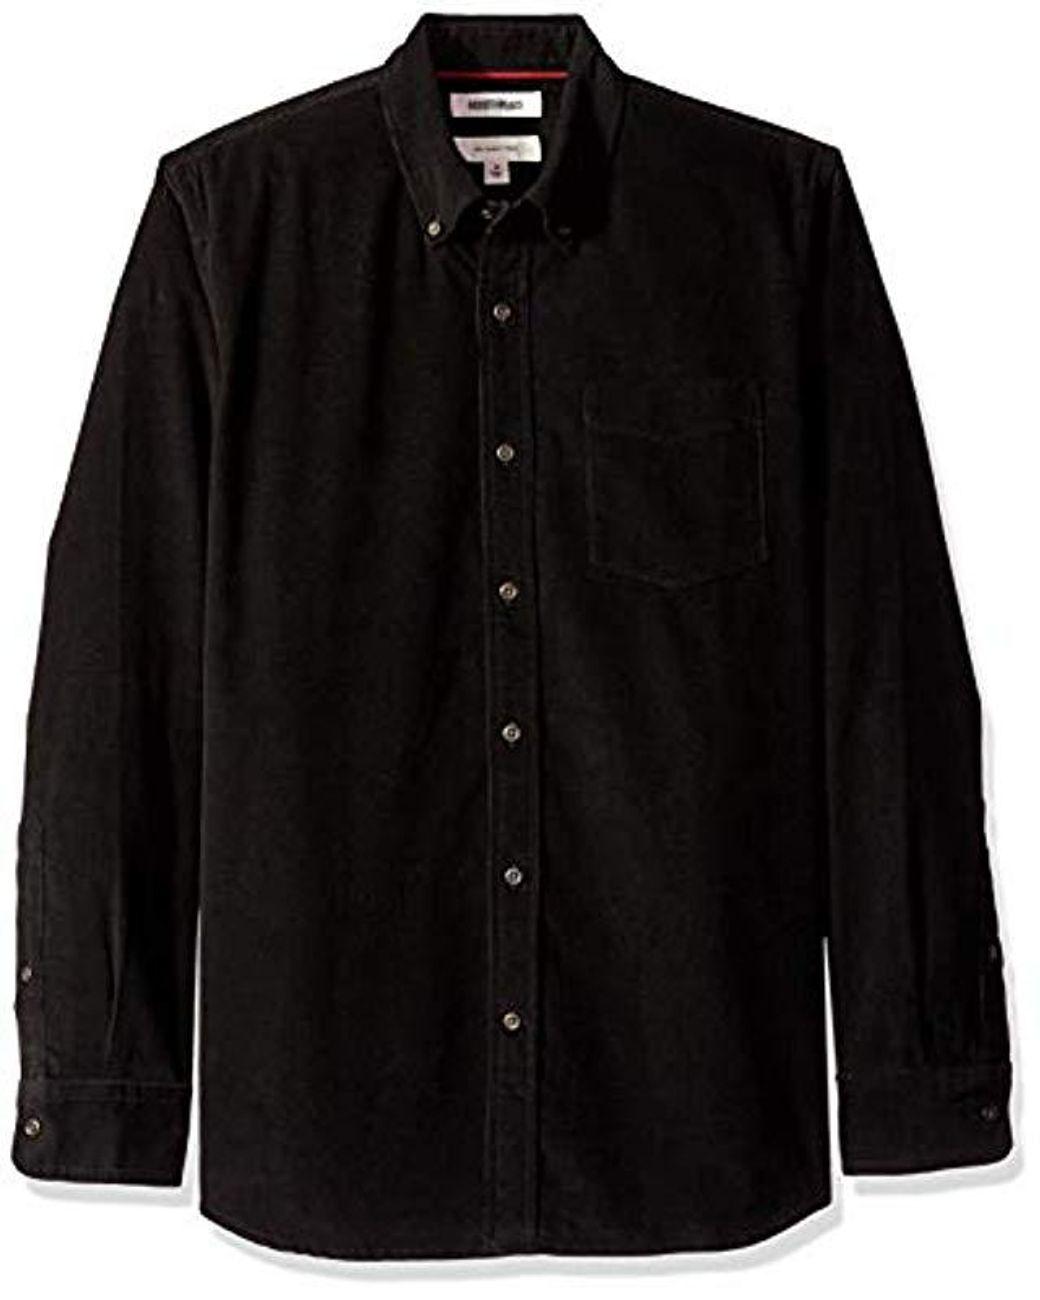 Brand Goodthreads Mens Slim-Fit Long-Sleeve Ripstop Dobby Shirt